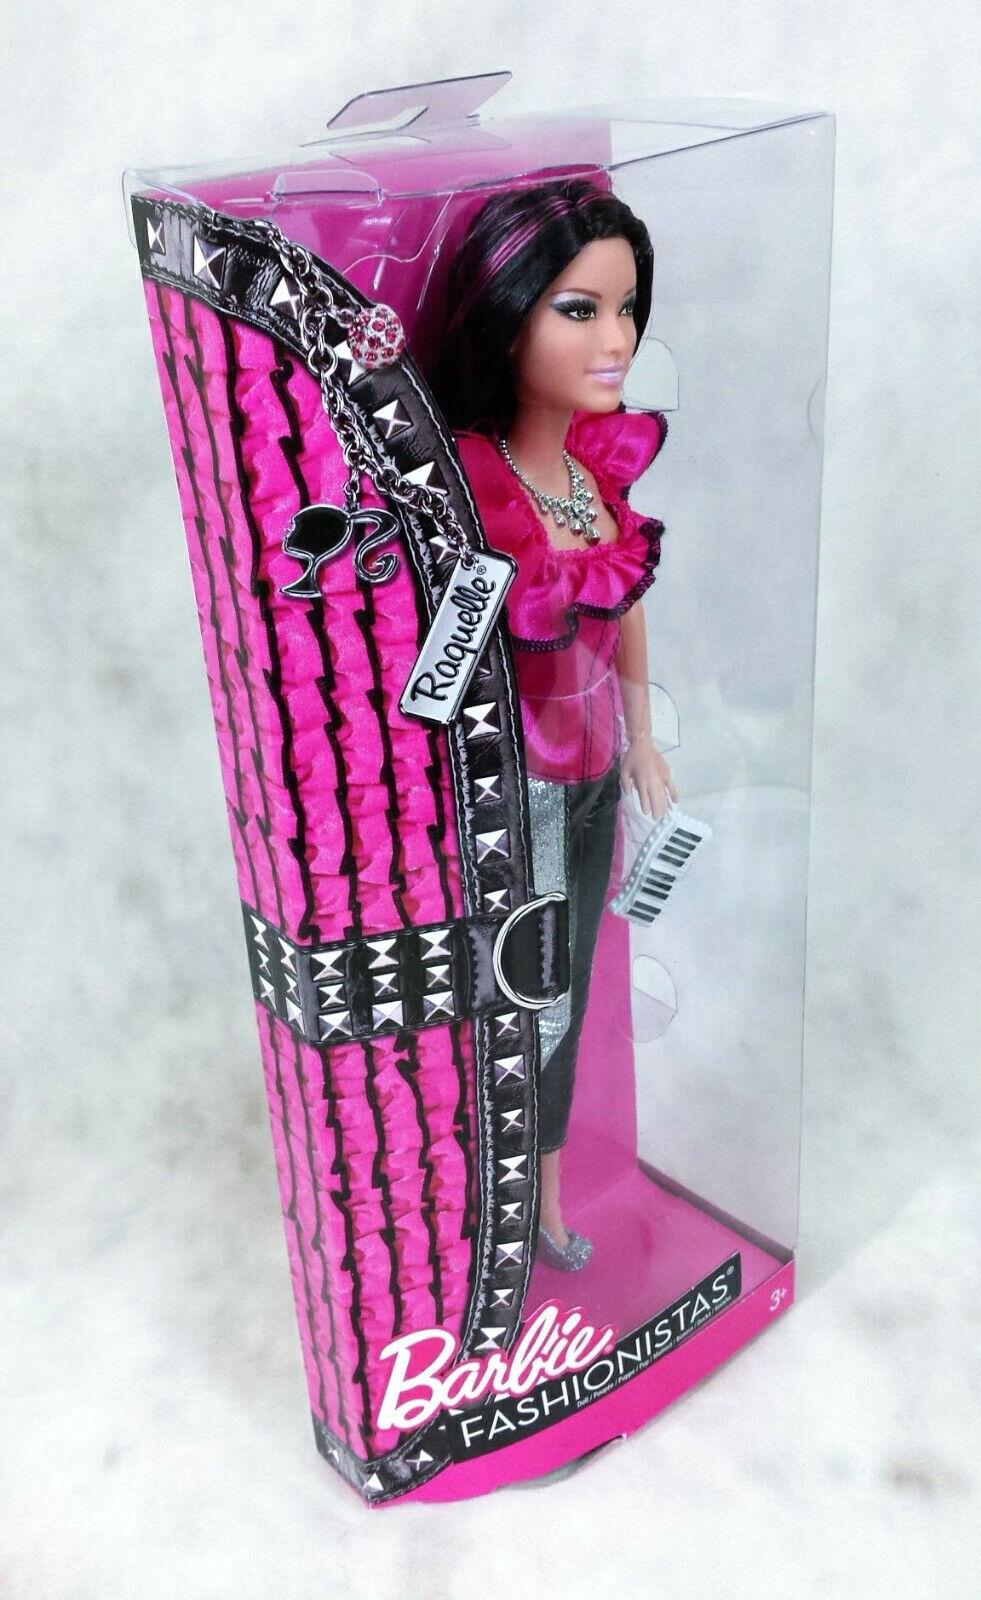 Barbie modaistas modaistas modaistas Raquelle 2011 nuovo BNIB 8b5454